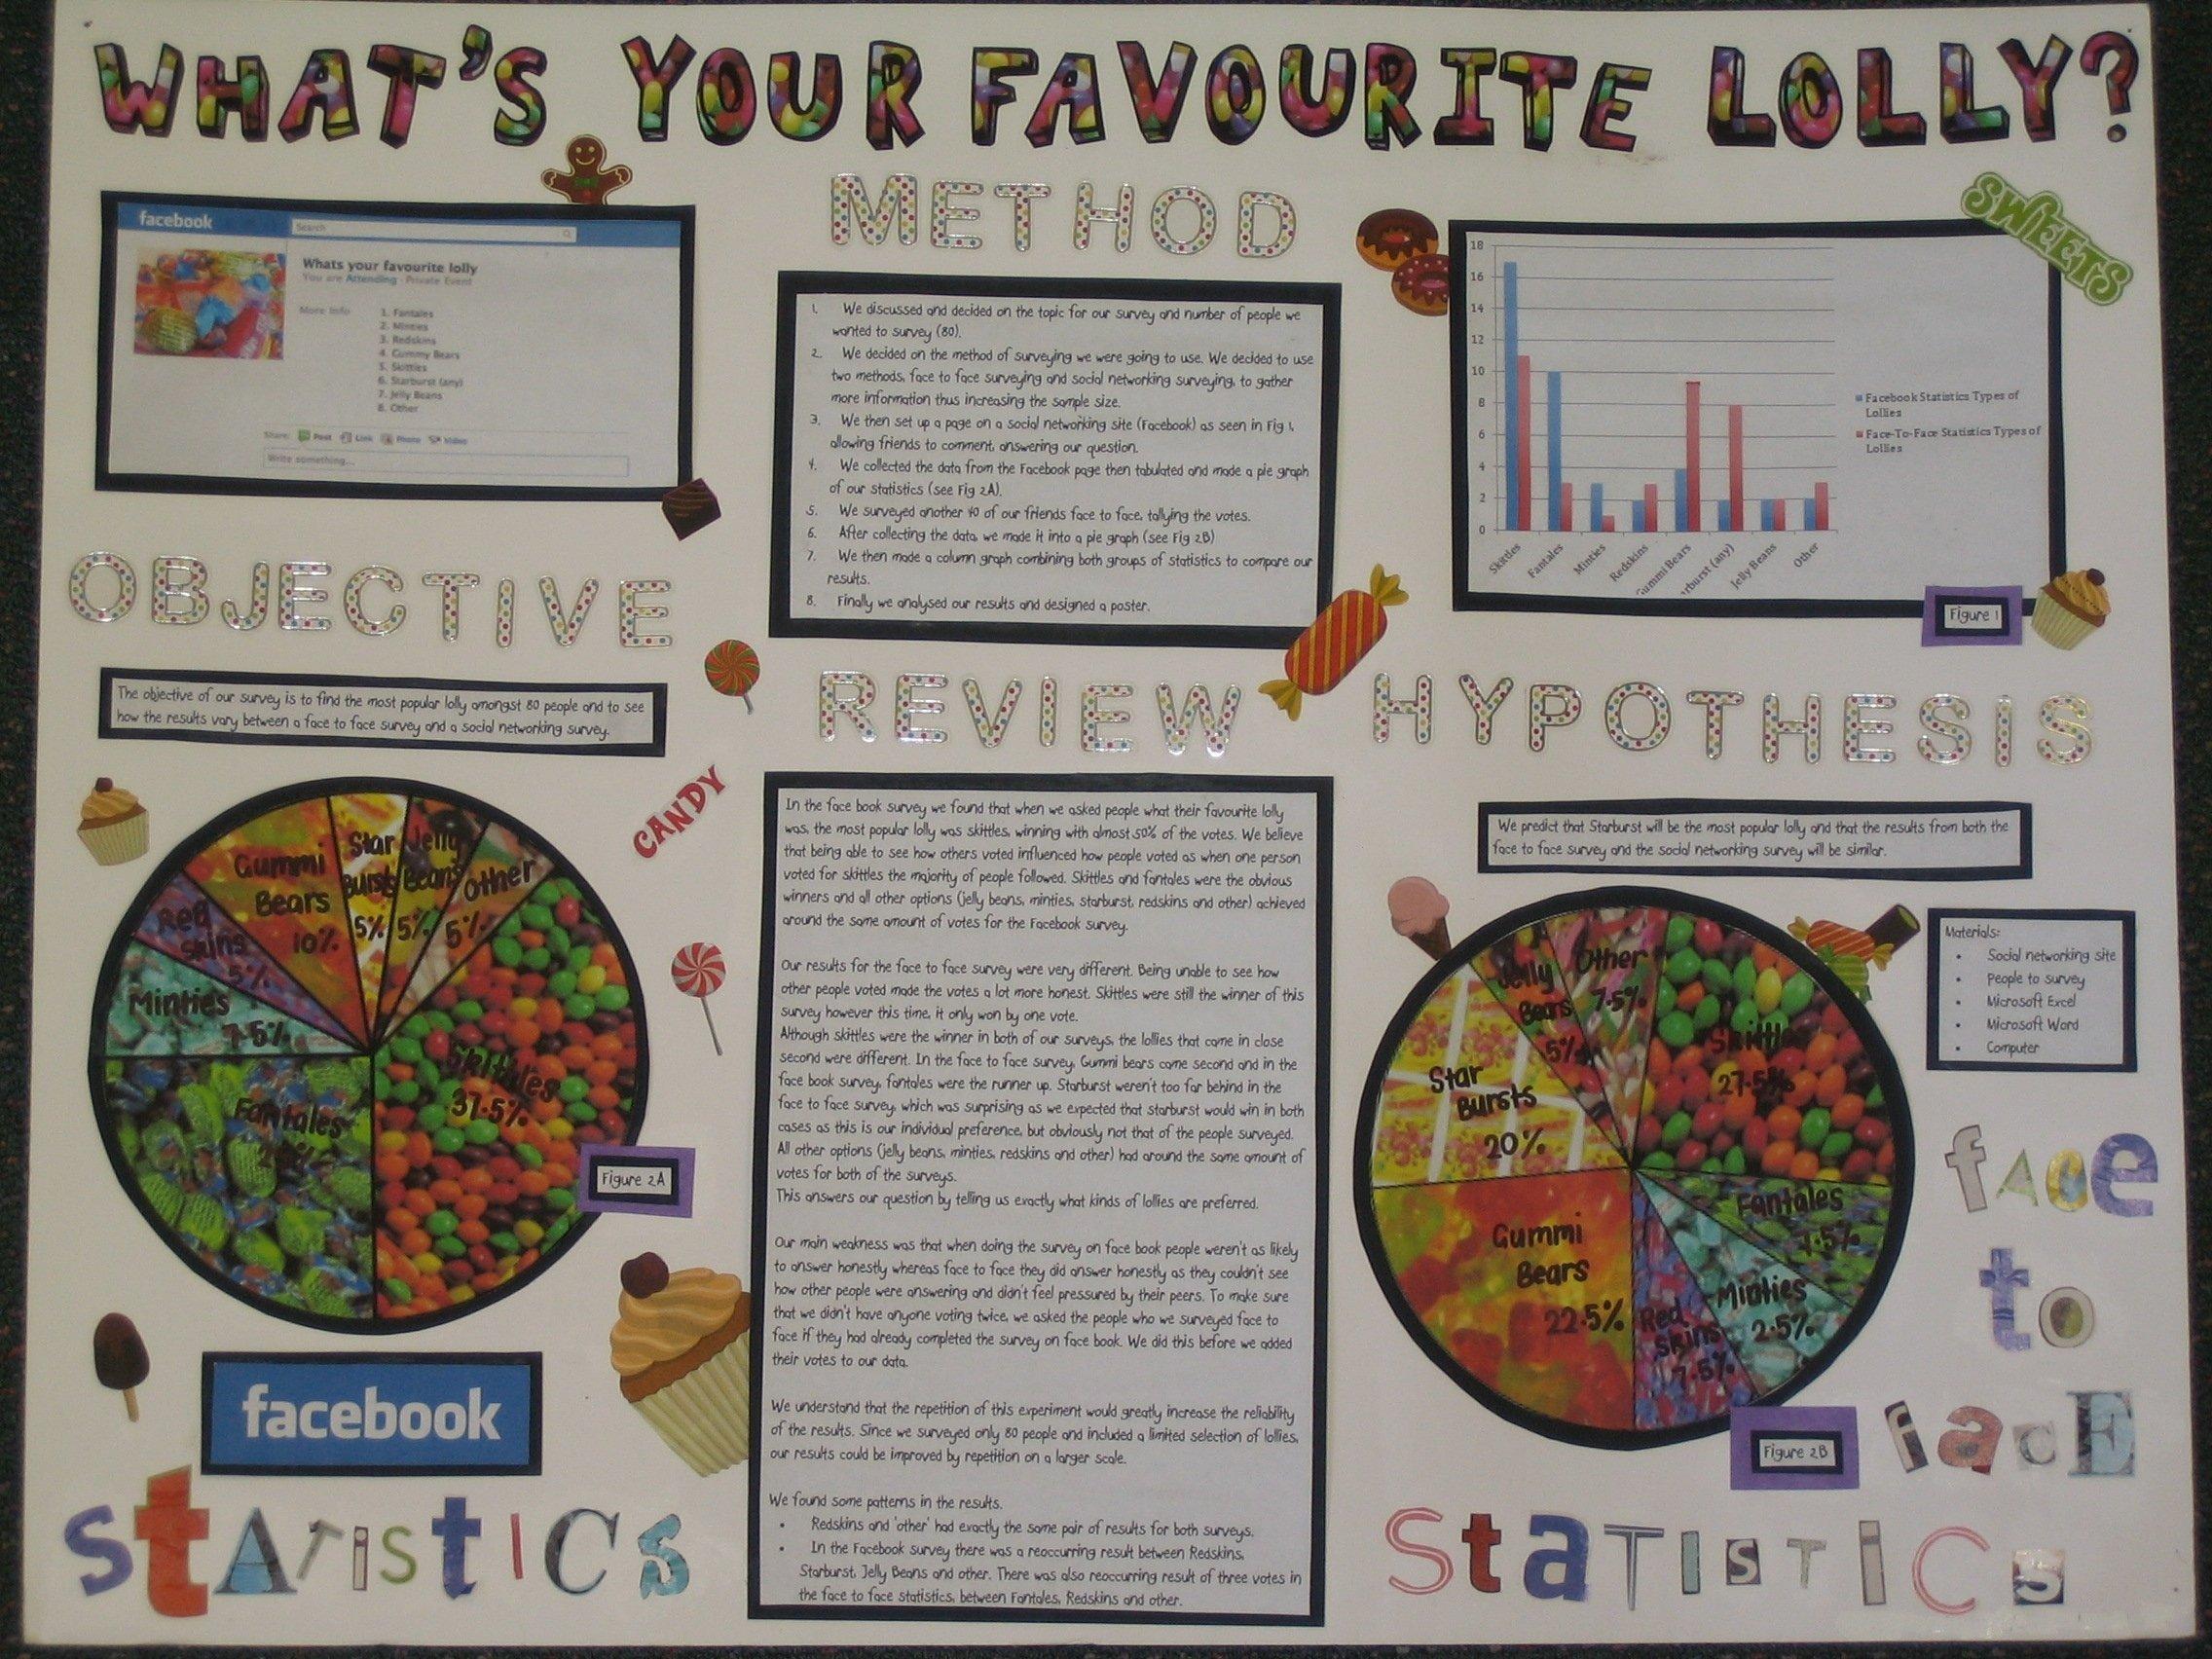 10 Beautiful Creative Project Ideas For School 27 great creative school project presentation 3 2020